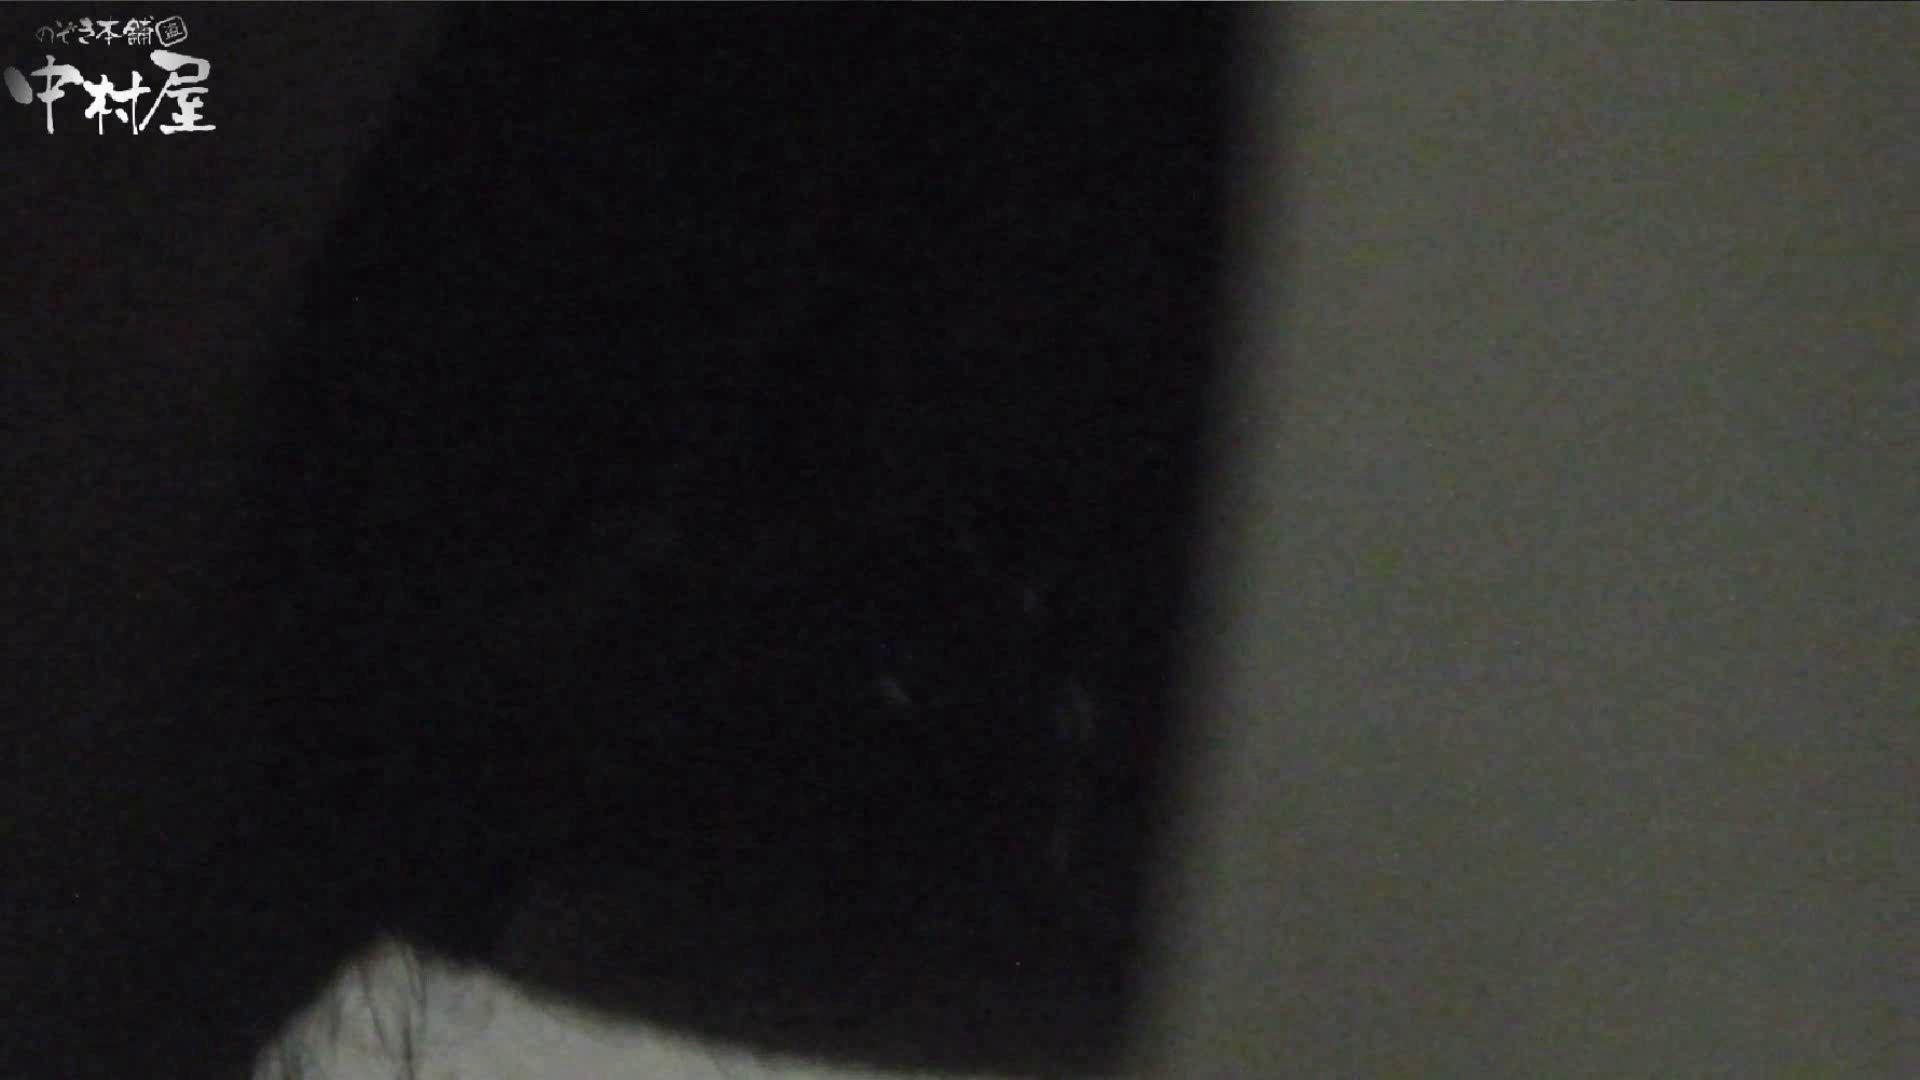 vol.42 命がけ潜伏洗面所! カカト上げながら・硬度強(太)・180g 潜入 | プライベート  101PIX 55